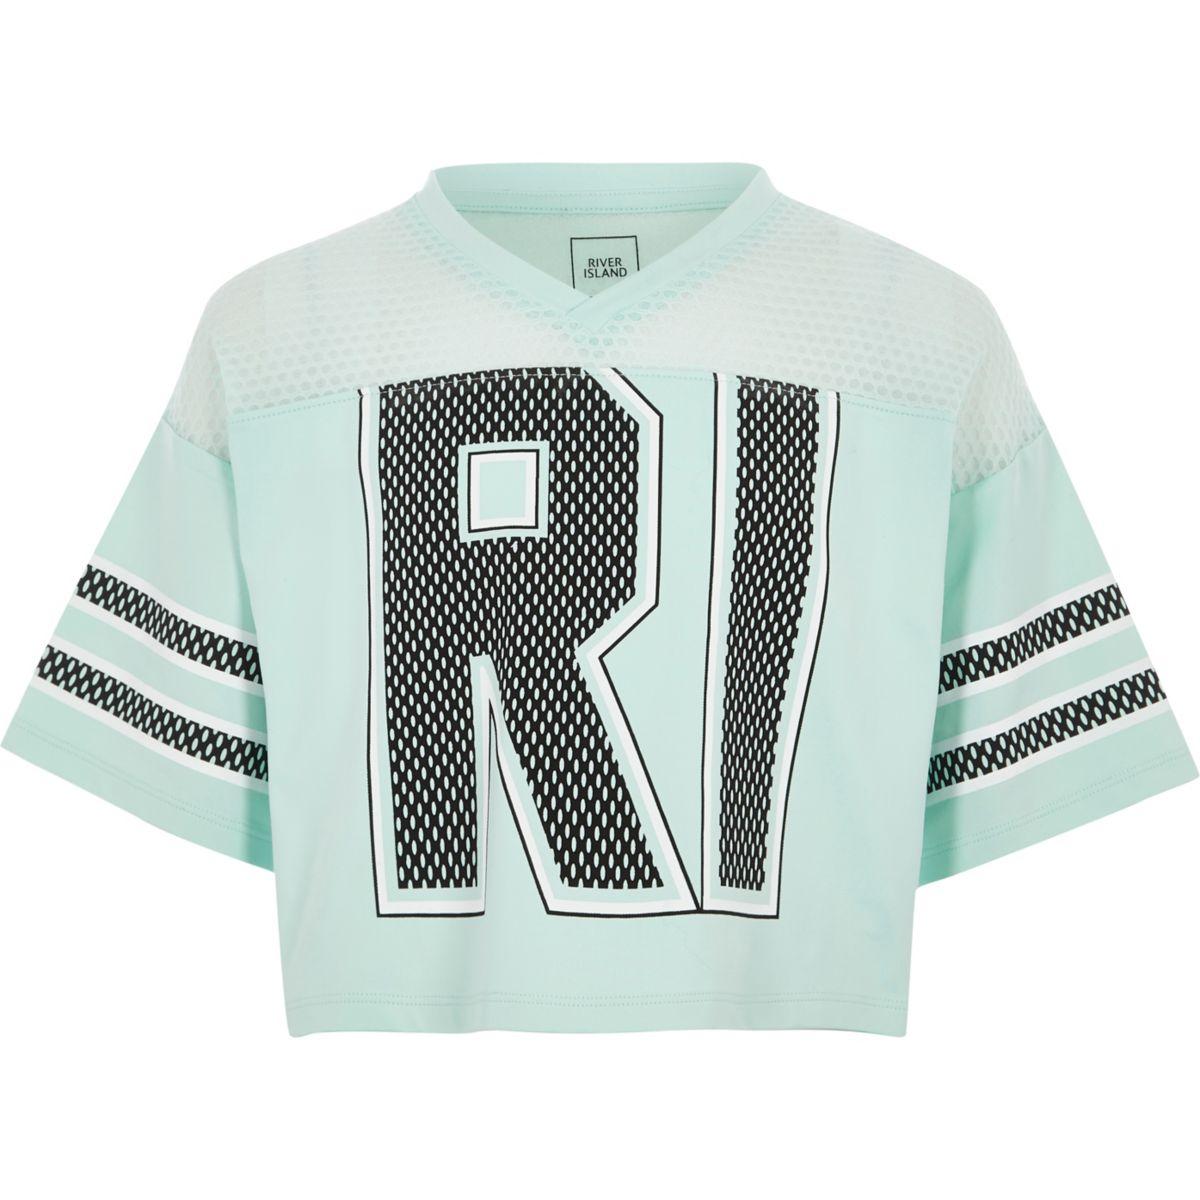 Girls mint Green RI varsity style T-shirt